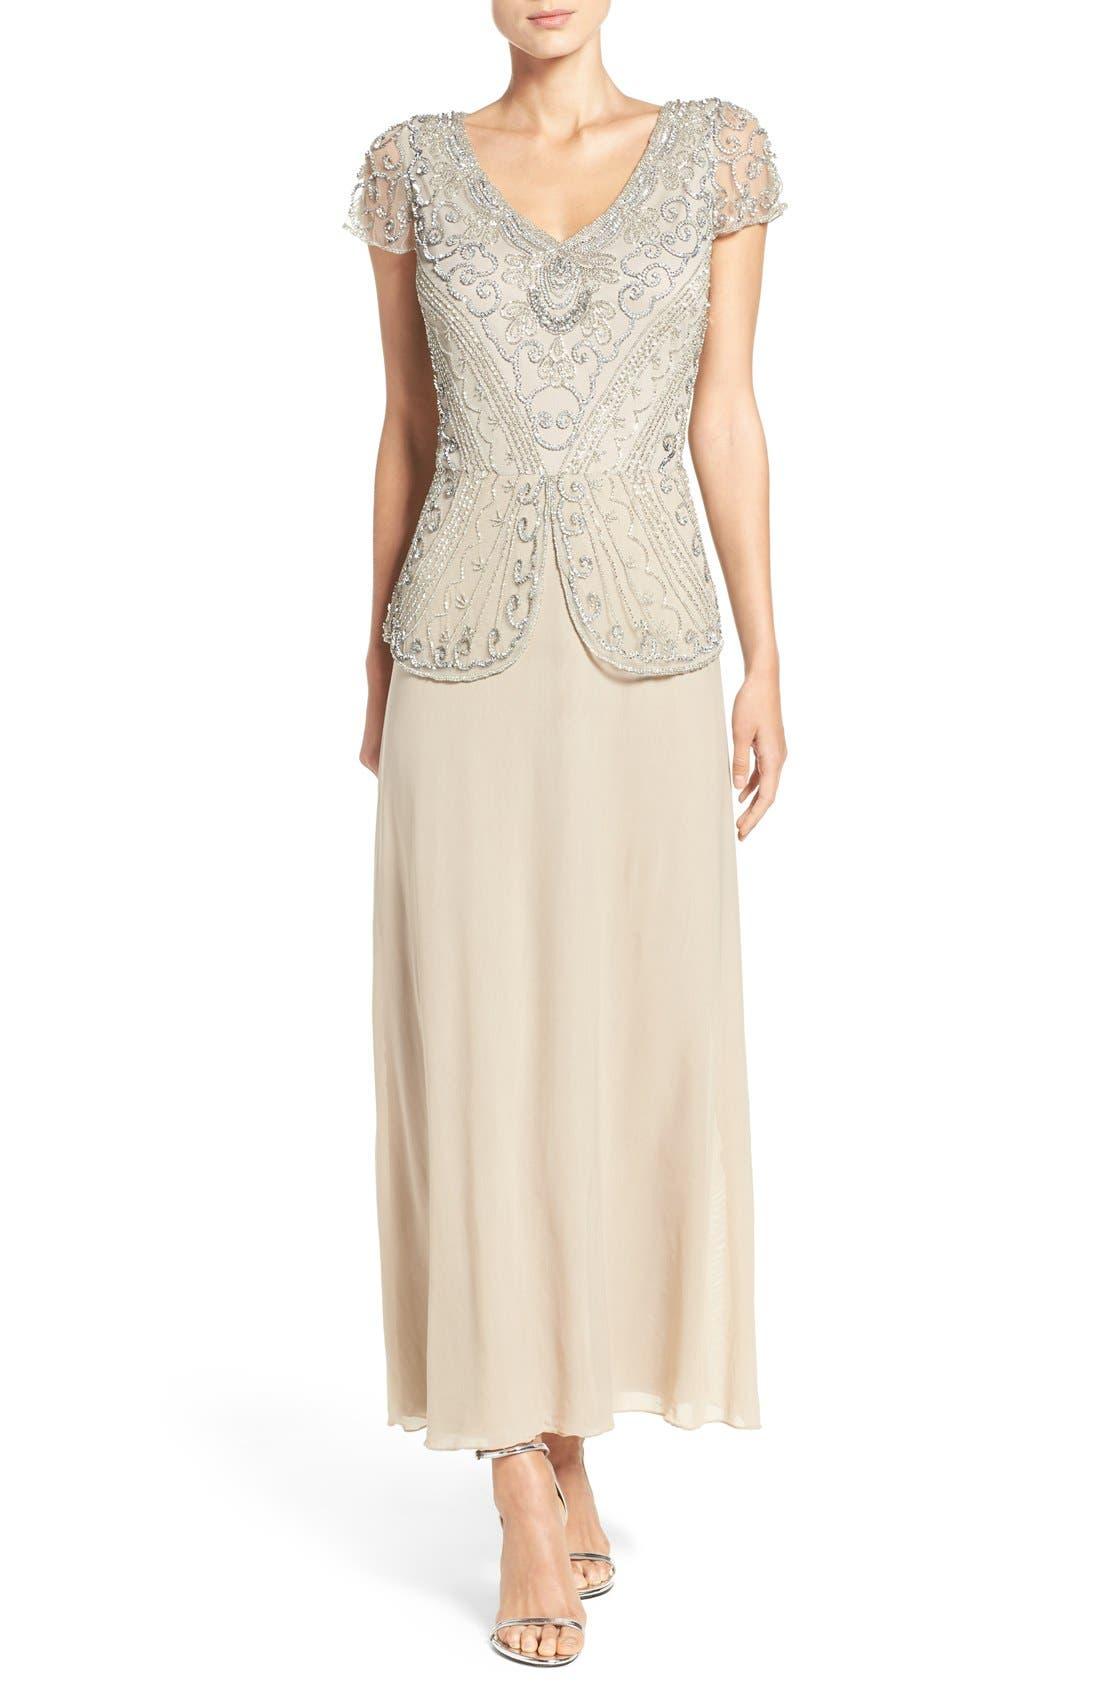 Alternate Image 1 Selected - Pisarro Nights Embellished Mesh Gown (Regular & Petite)